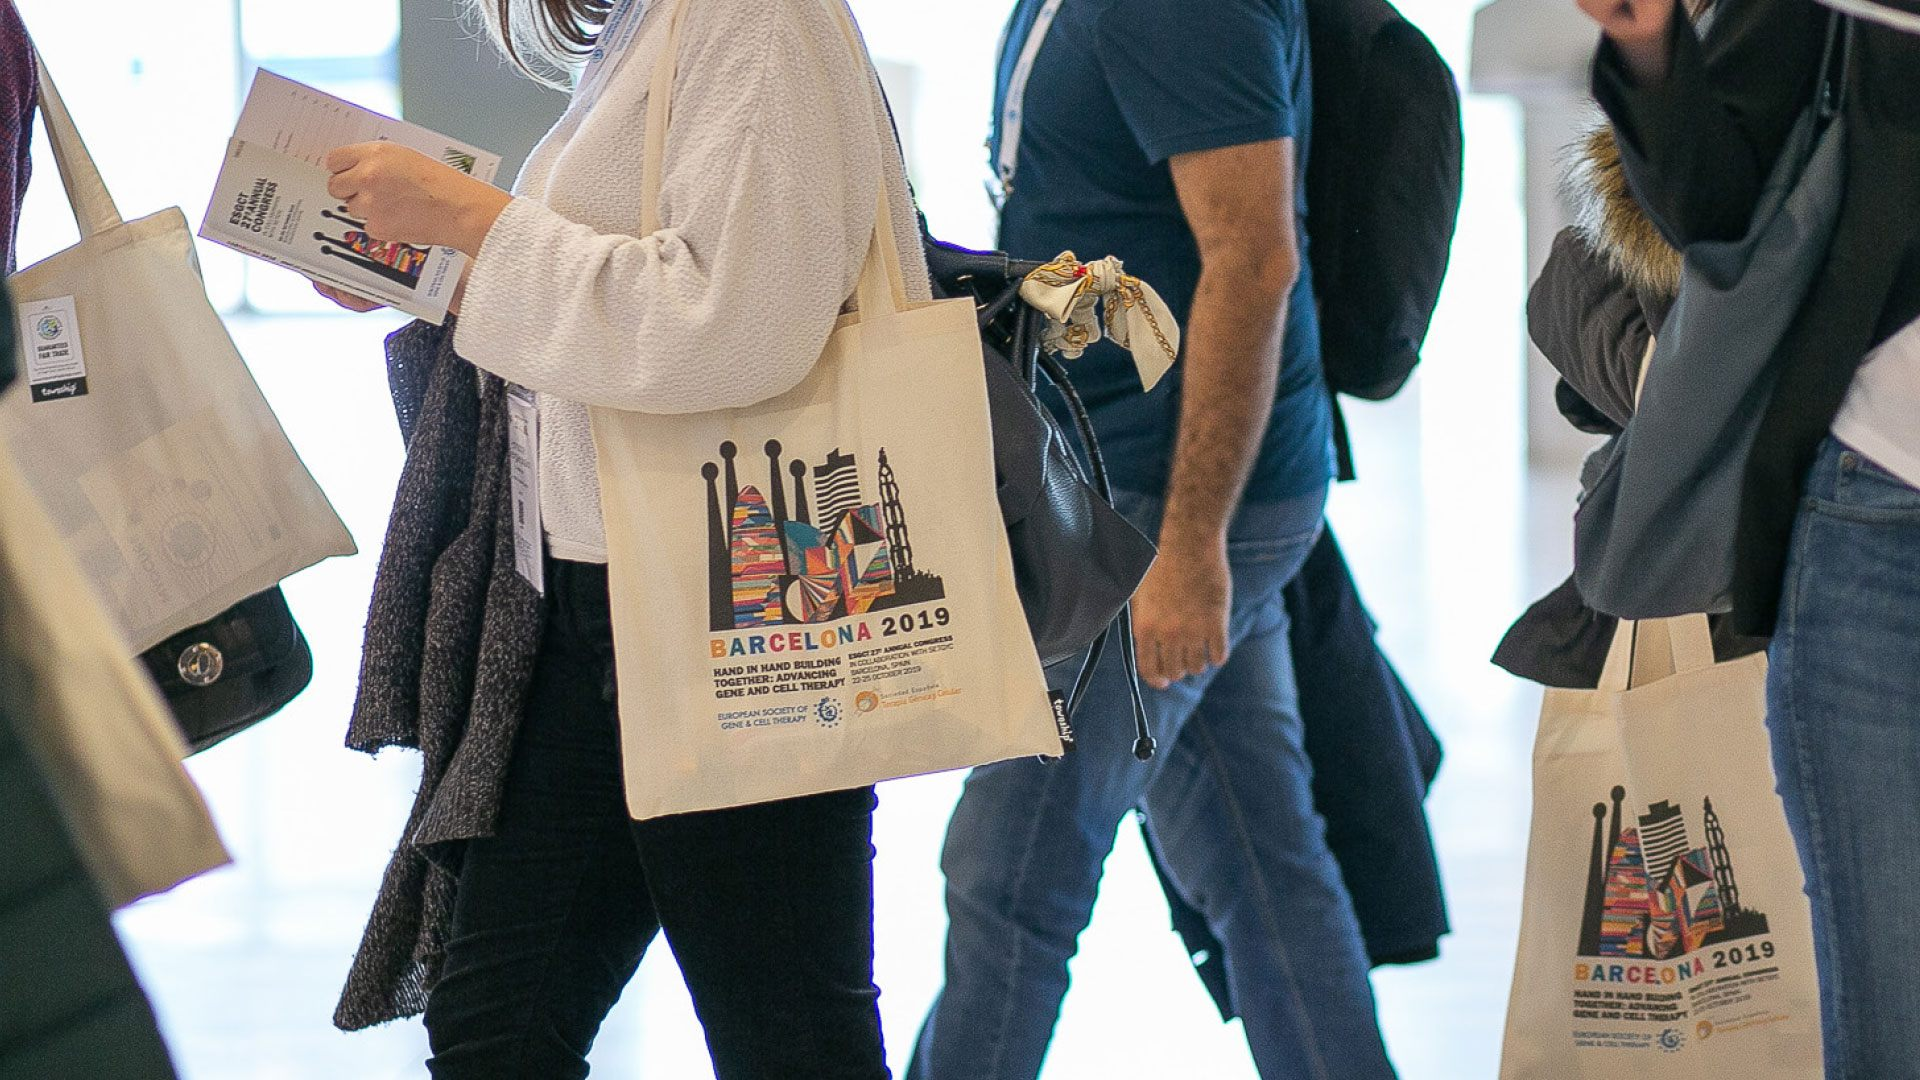 Barcelona 2019 promotional bags